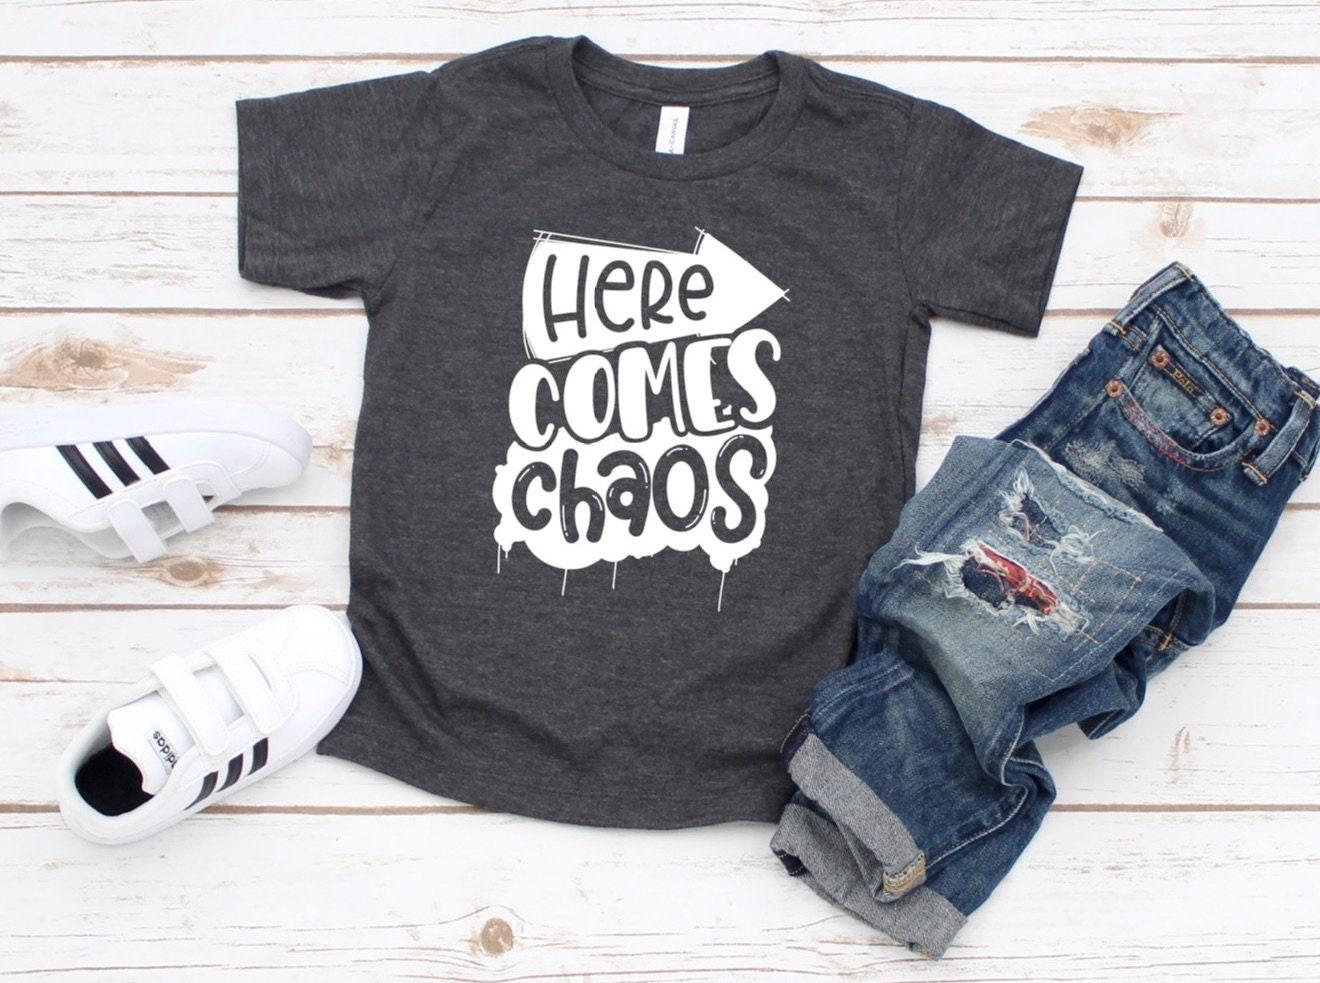 bc5609b2c691c Here Comes Chaos Shirt, Boys Chaos Shirt, Funny Boy Shirt, Cute ...